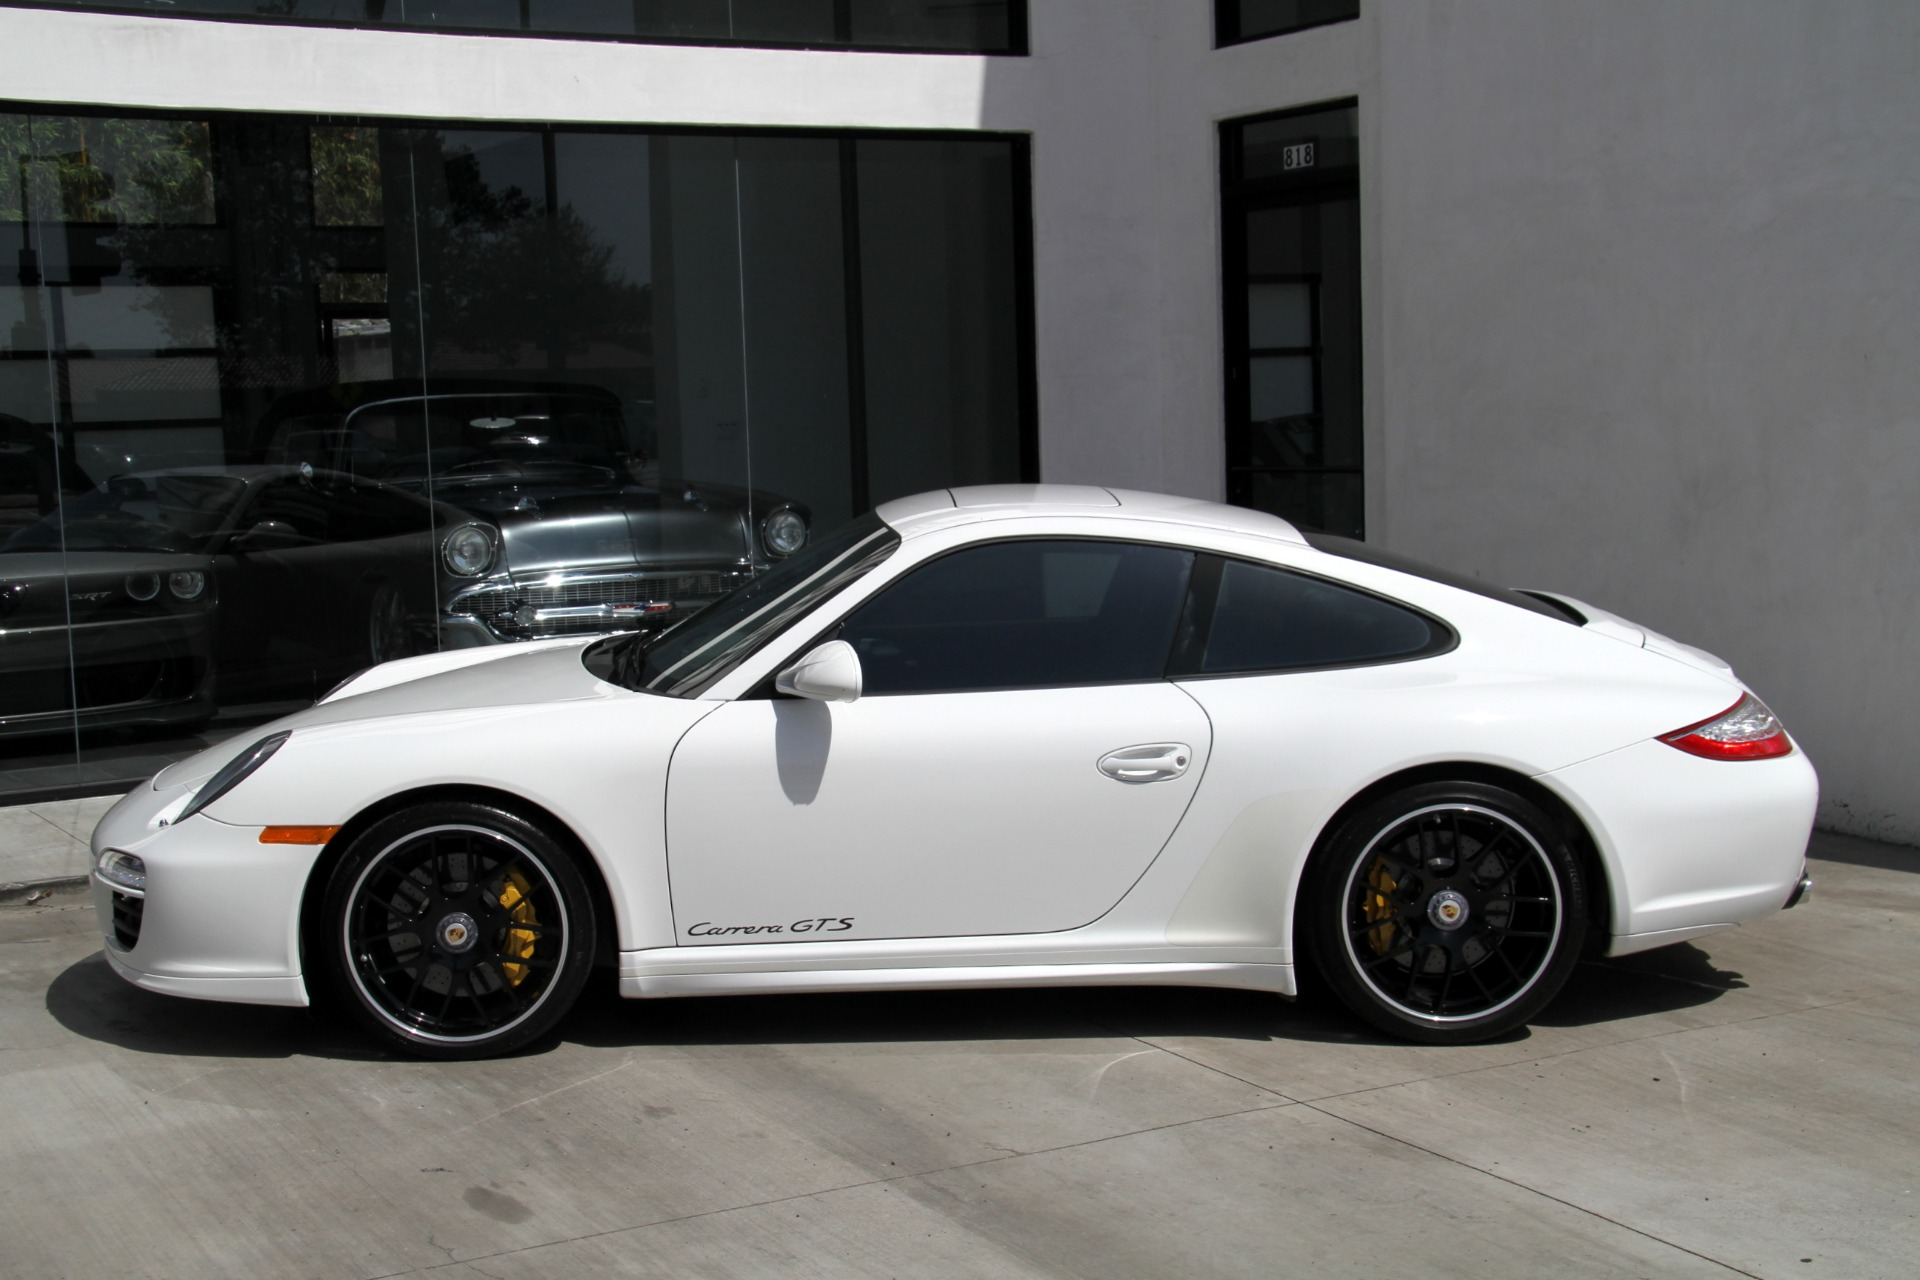 12k In Miles >> 2011 Porsche 911 Carrera Gts Only 12k Miles Stock